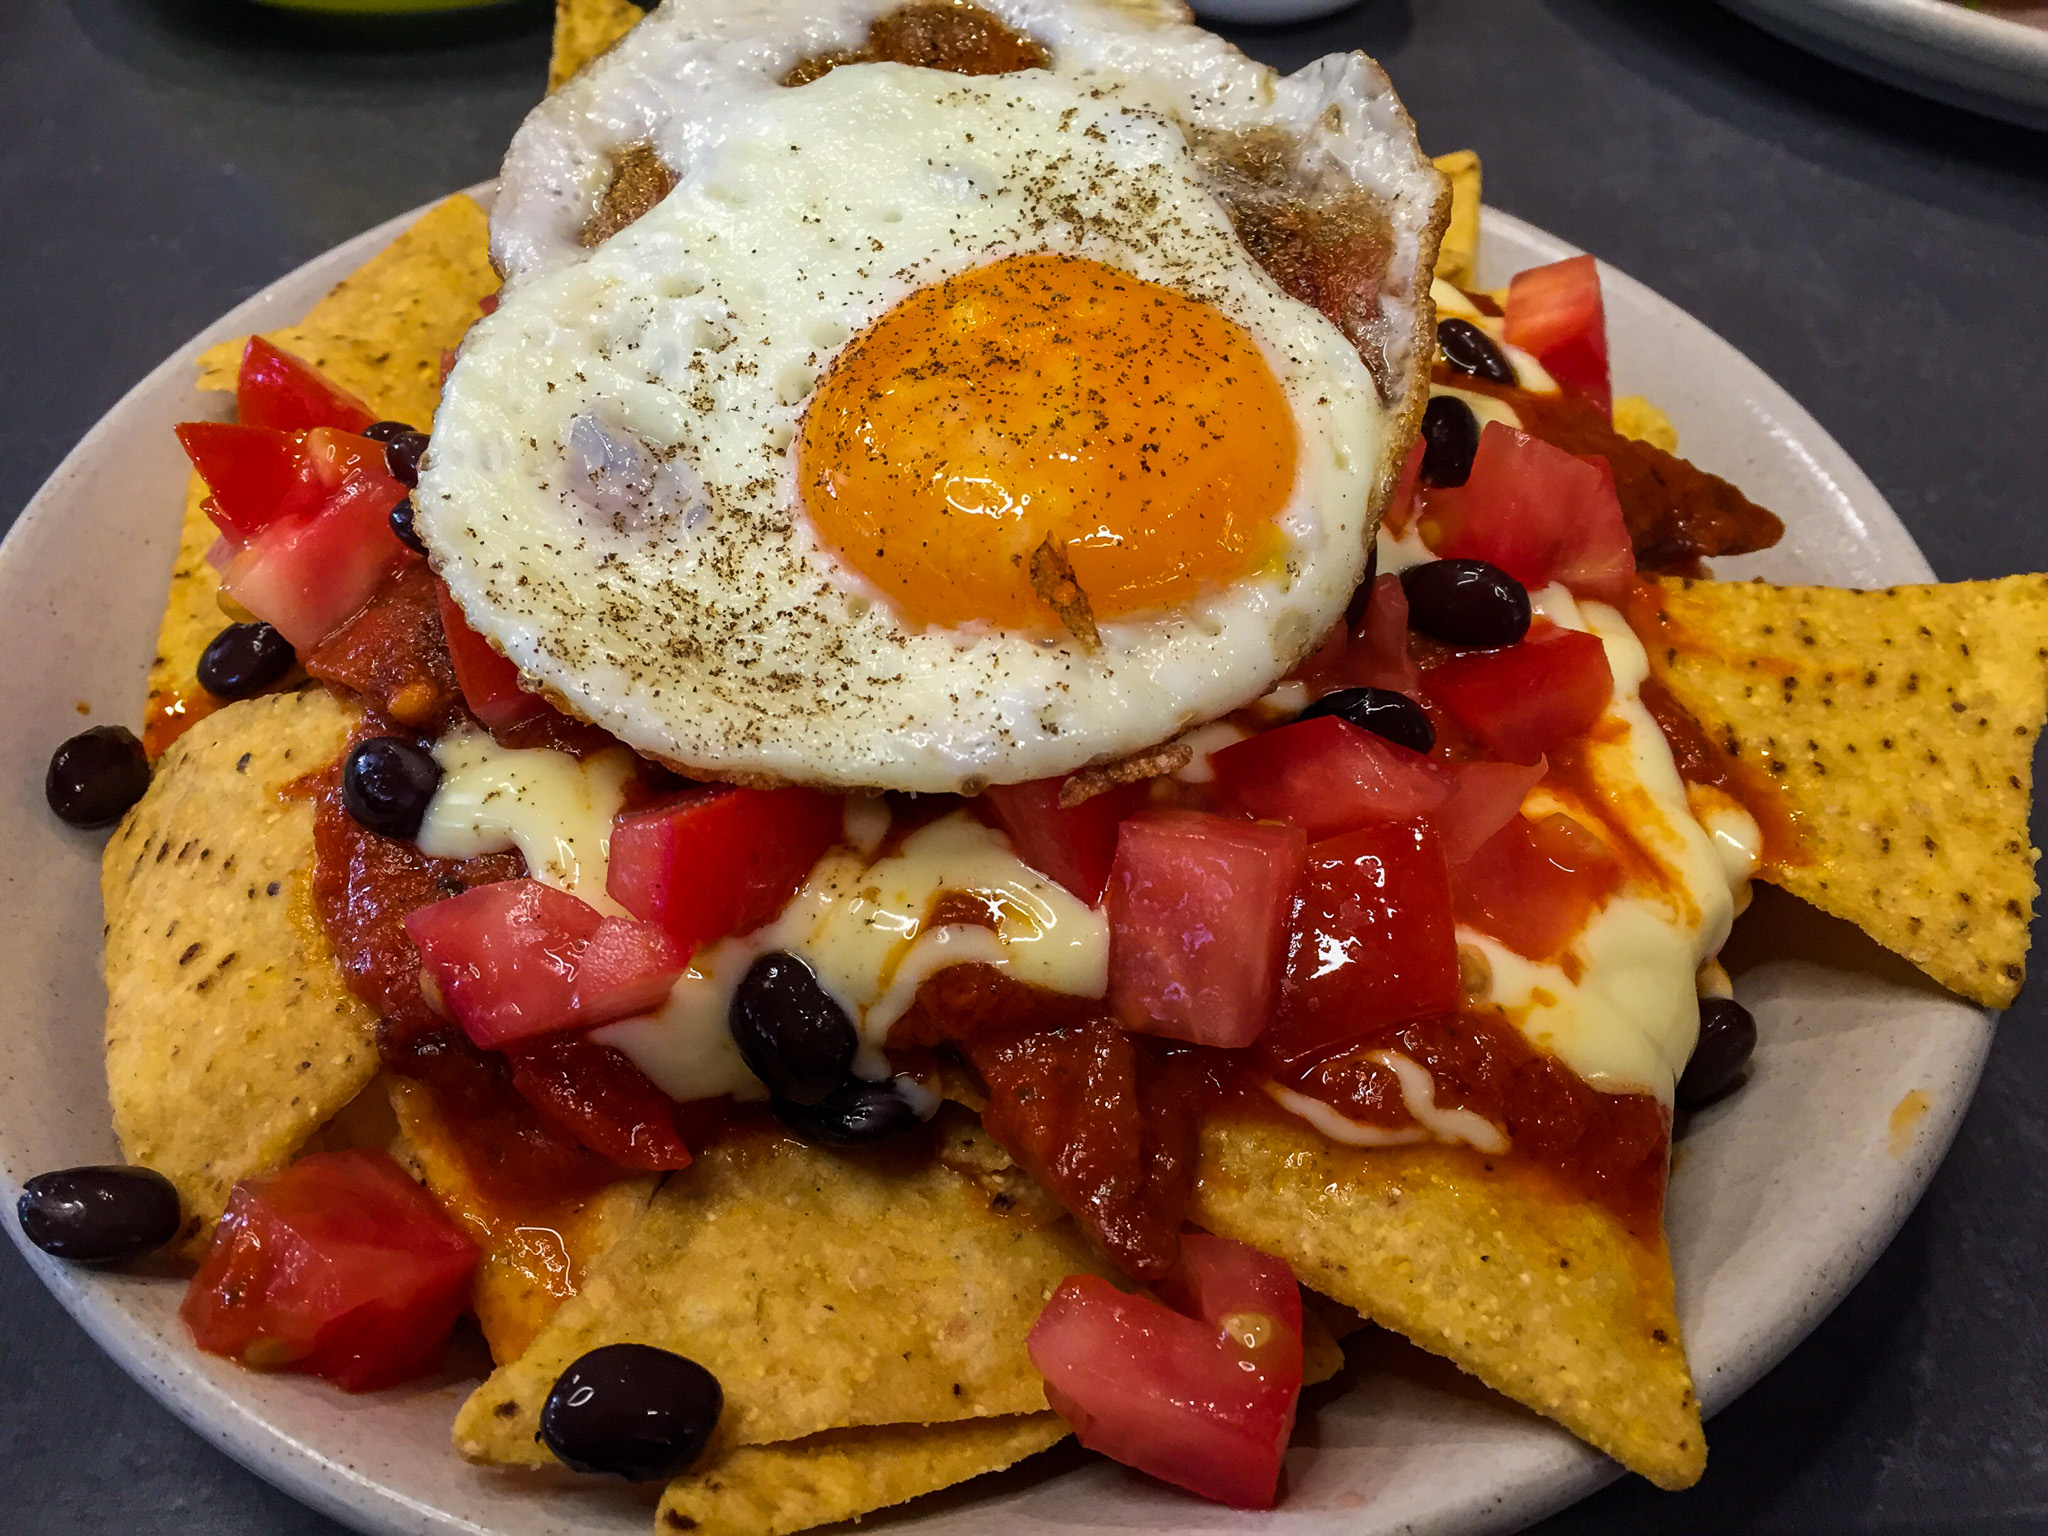 Gary Lum Breakfast nachos from Chatterbox Espresso Bar